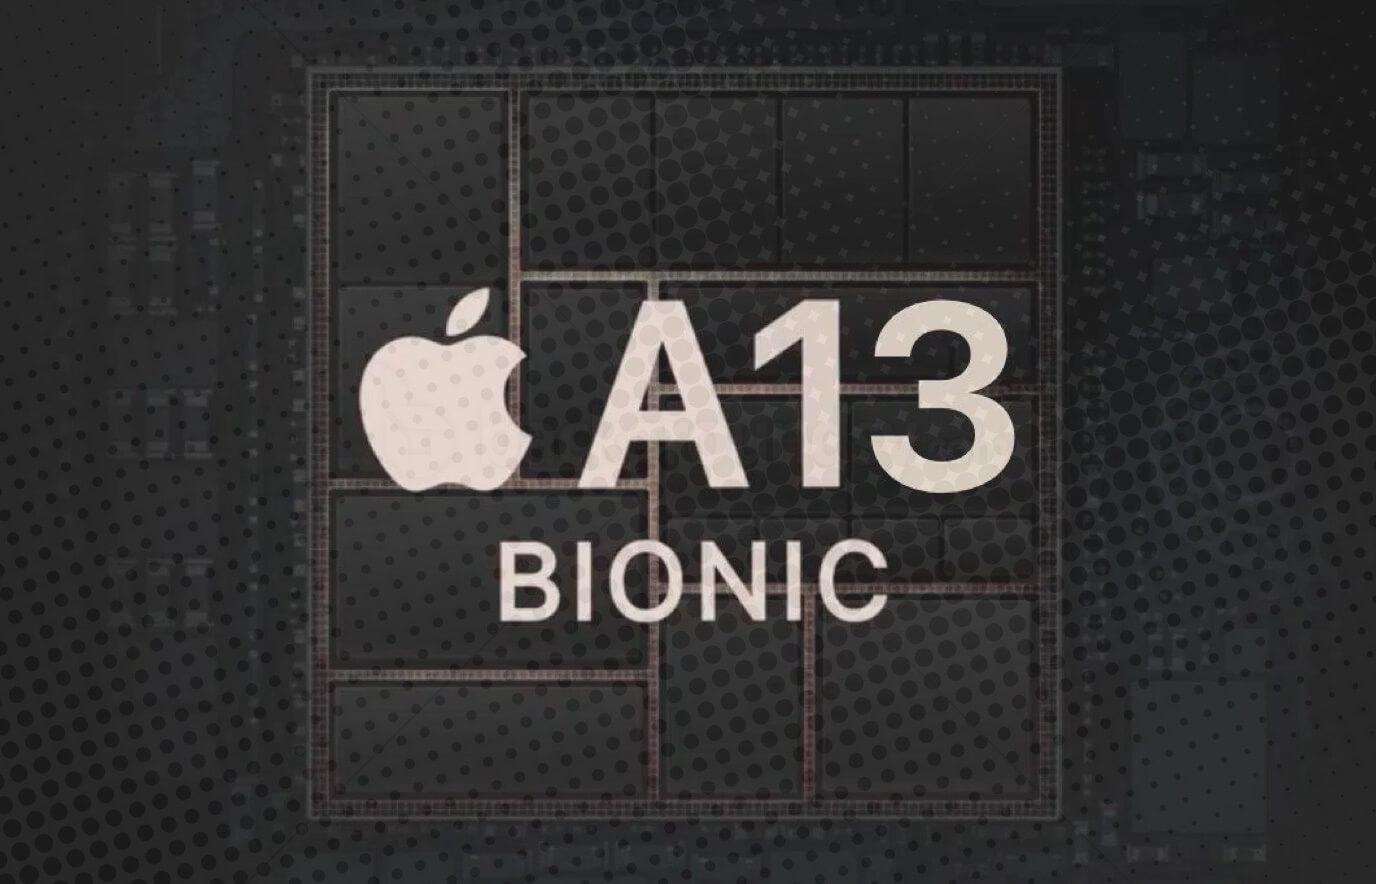 A13 Bionic chip